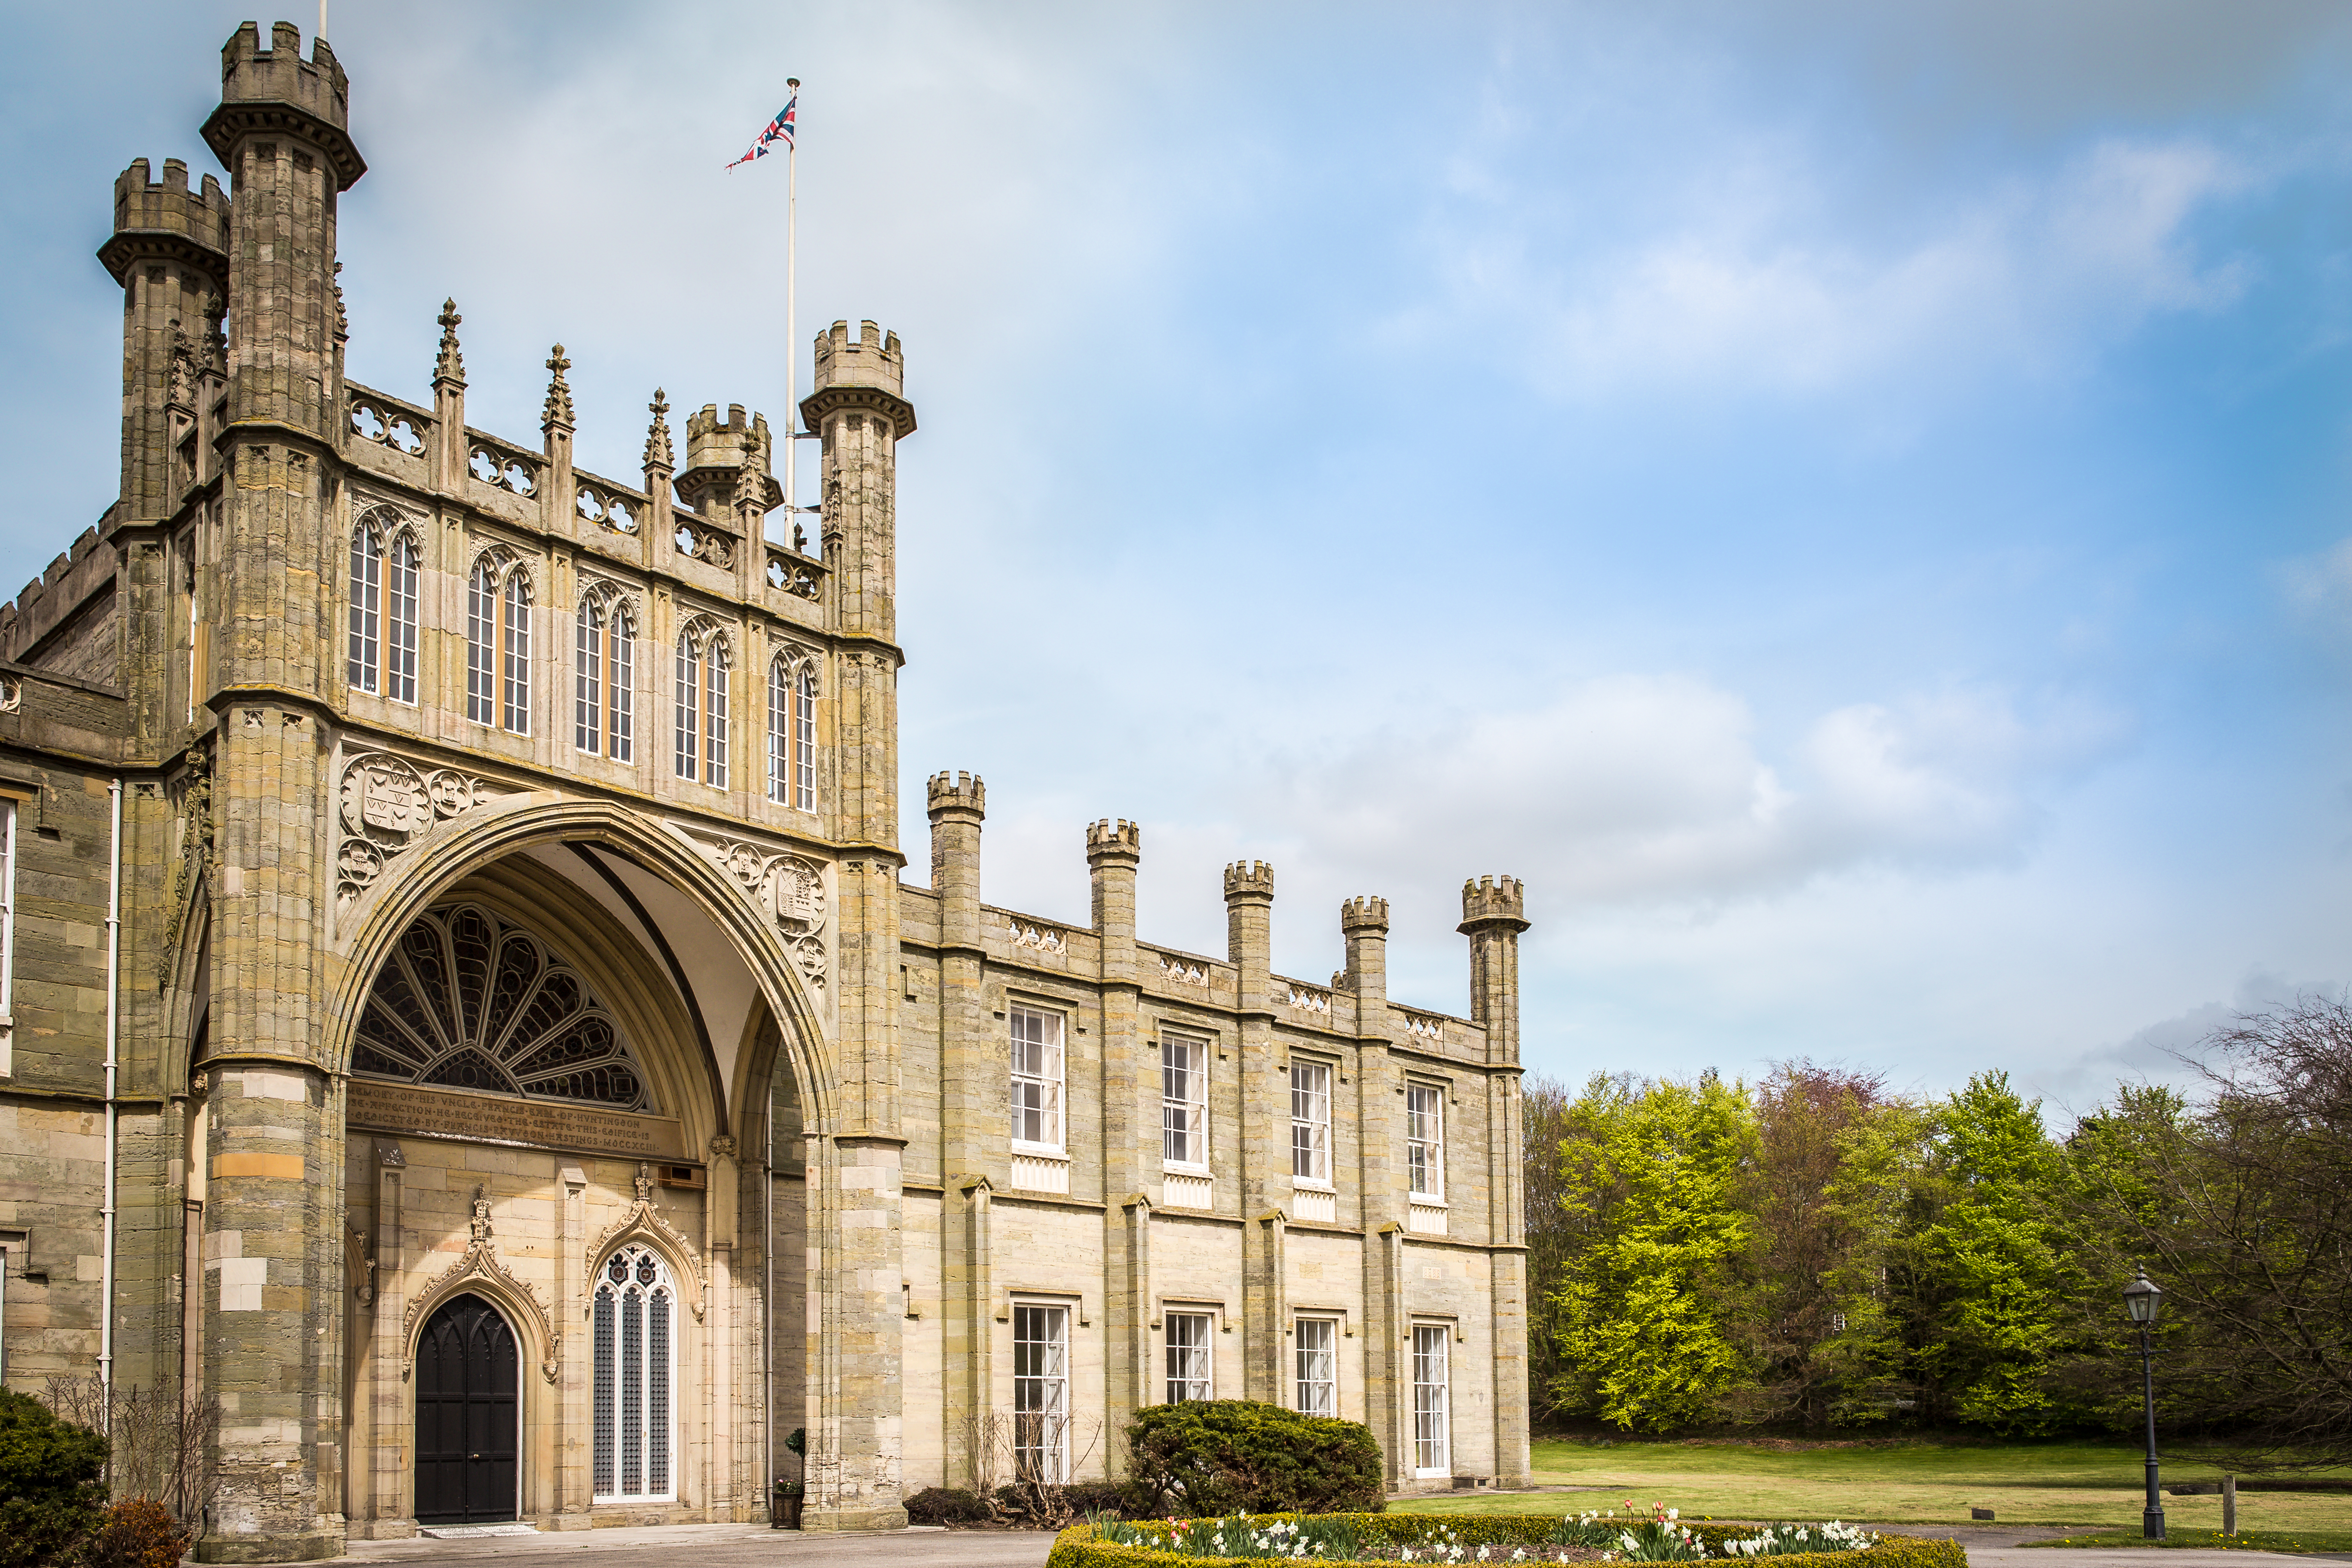 Party and wedding venue - Donington Hall